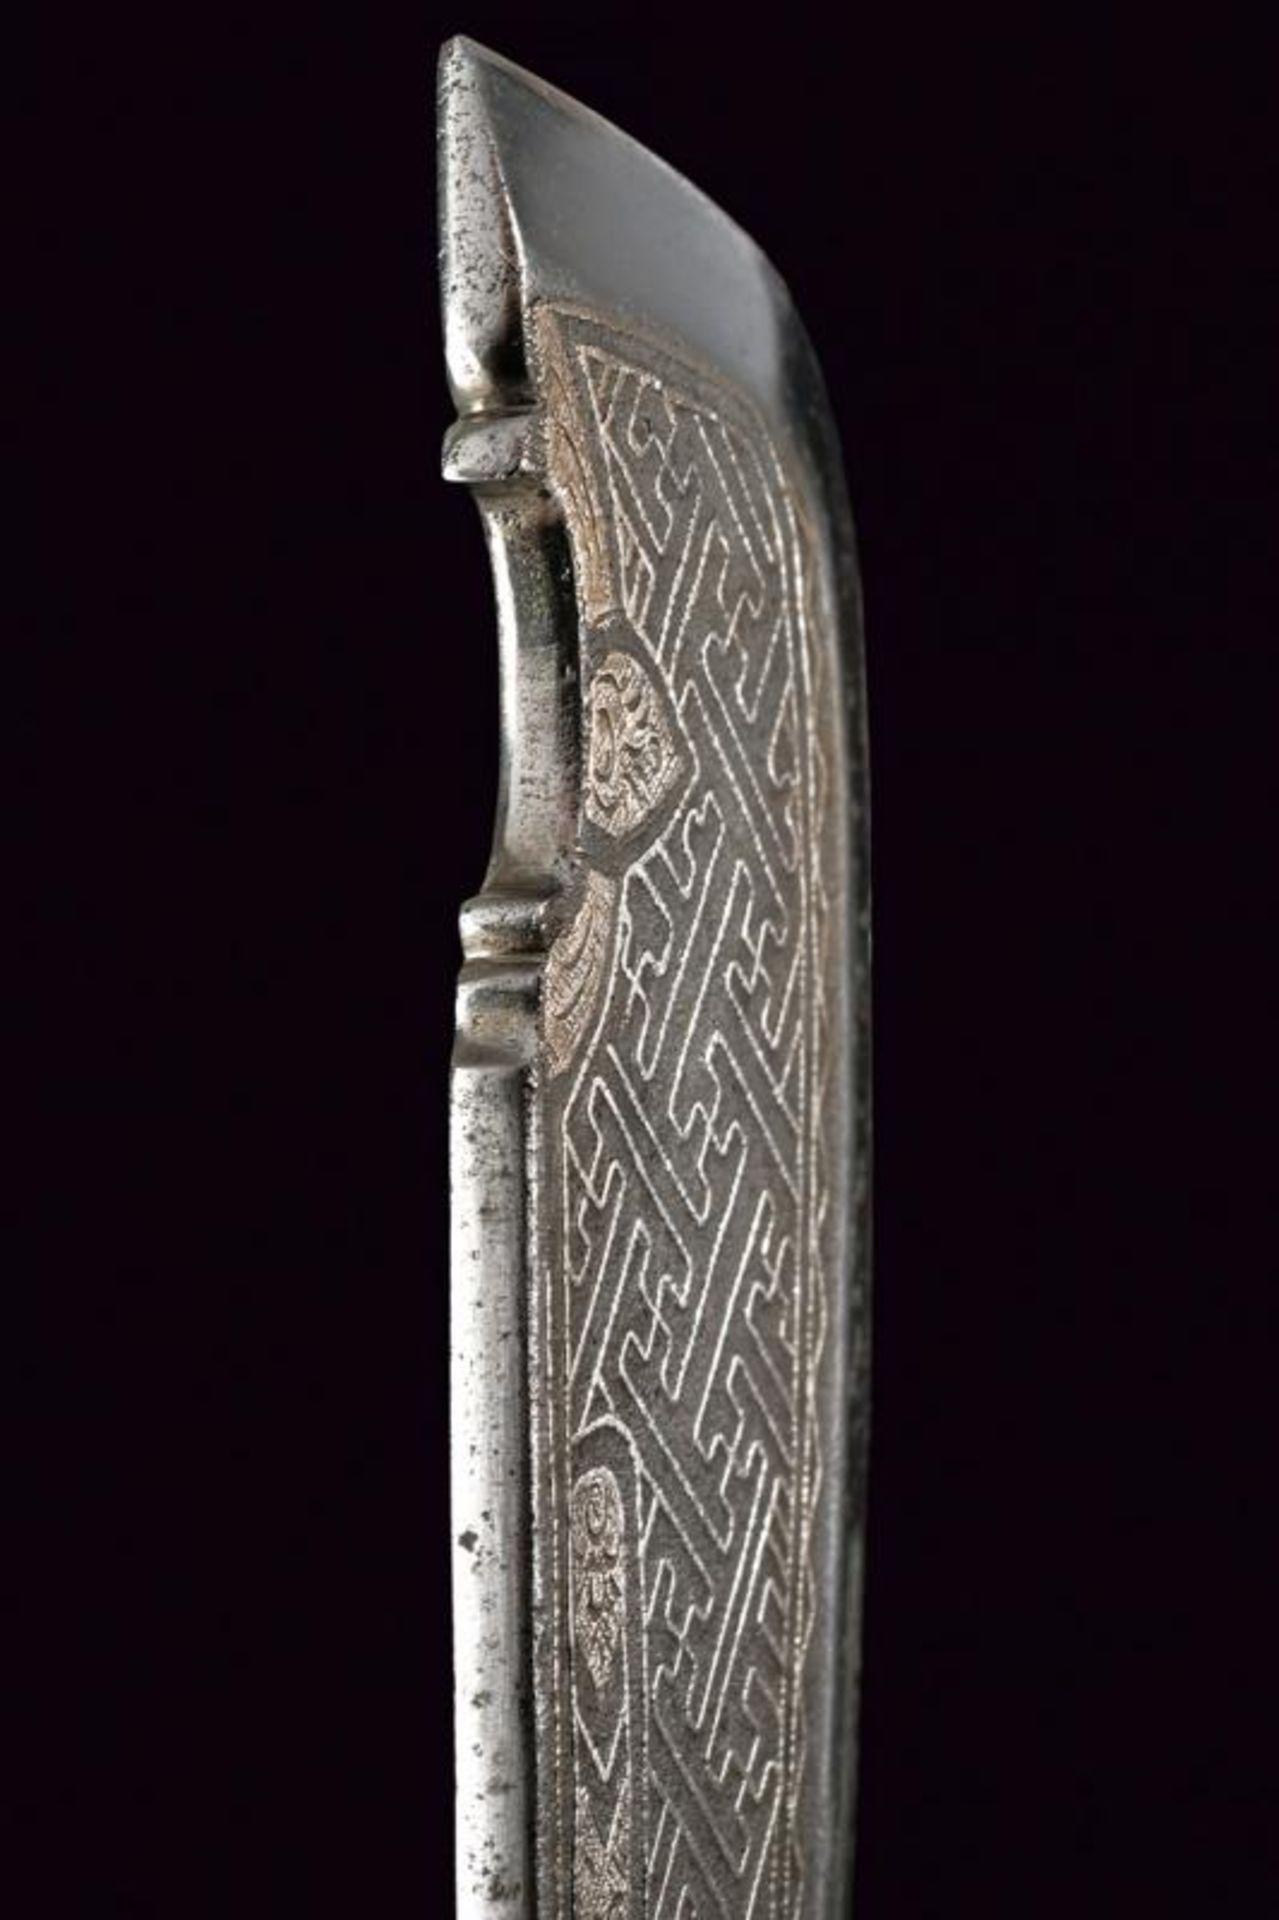 A ceremonial axe with silver hilt - Bild 3 aus 6